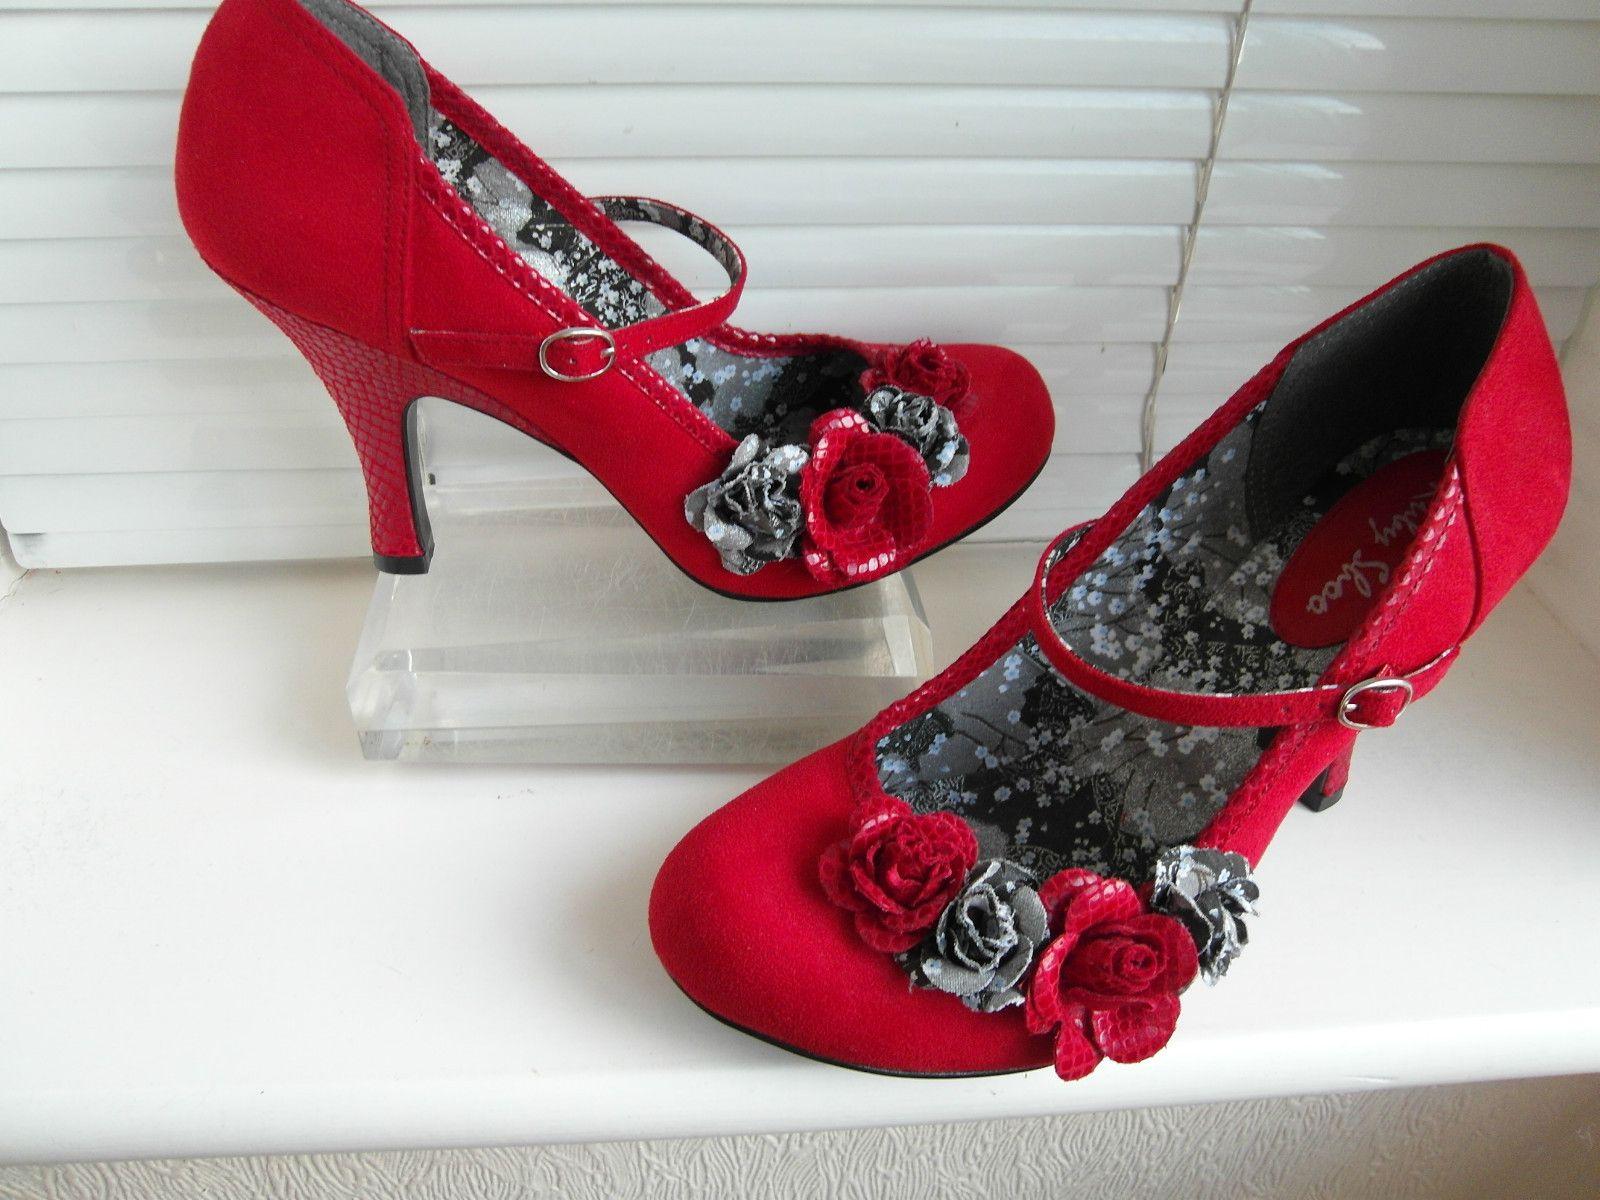 33f7fb08 Size 8 (41) Red RUBY SHOO O'HARA Strap Shoes | I love Ruby Shoo ...